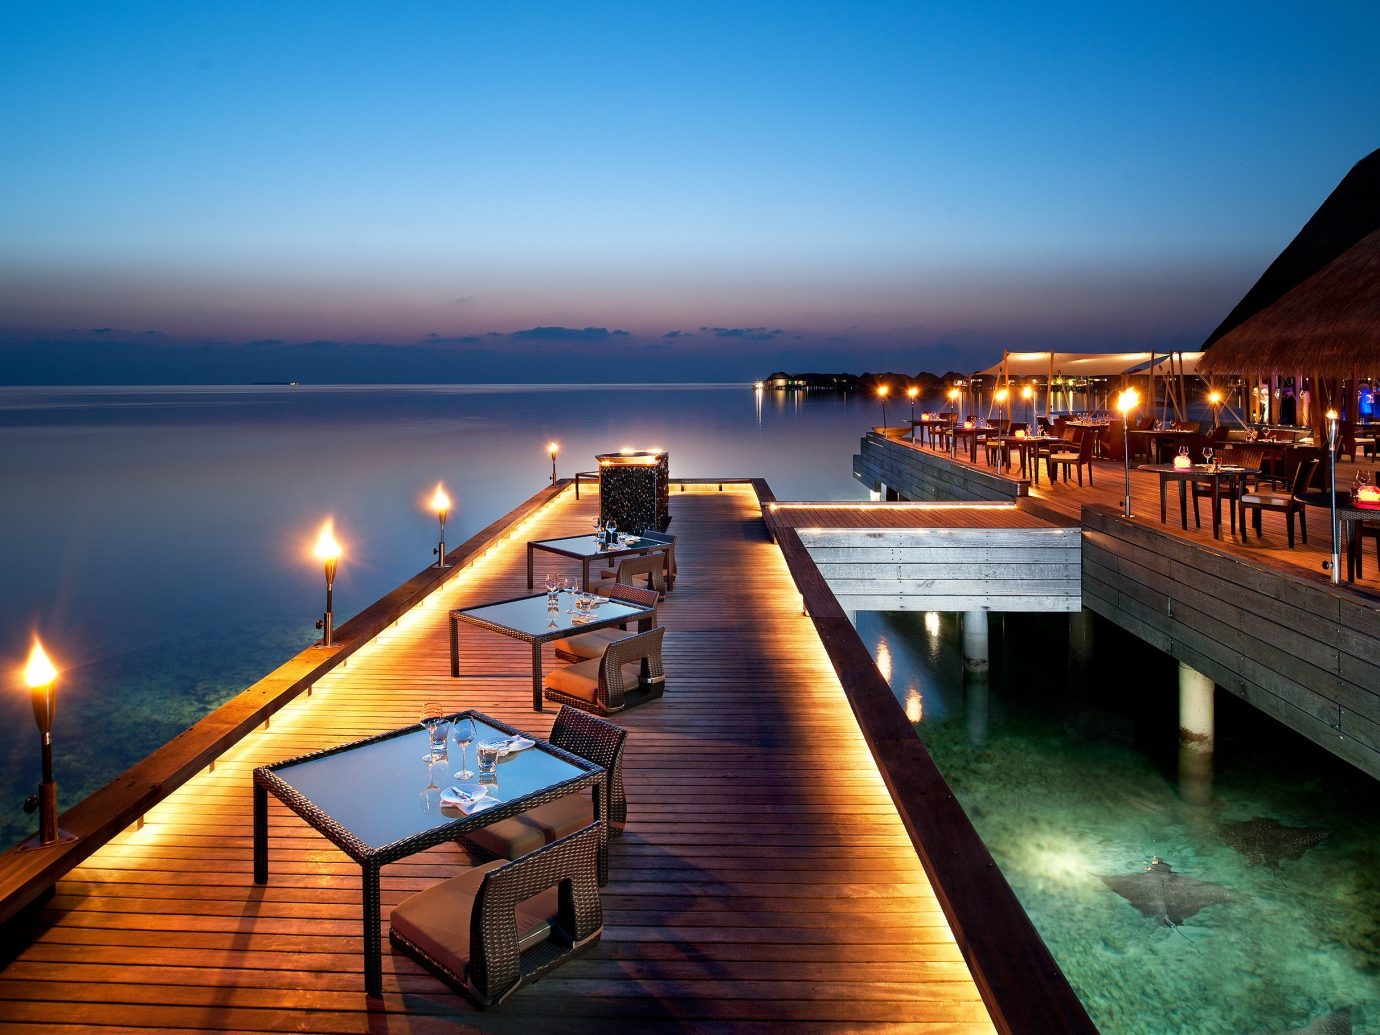 Trip Ideas sky water scene outdoor pier Sea reflection Ocean night vacation evening dock dusk Sunset bay Resort marina